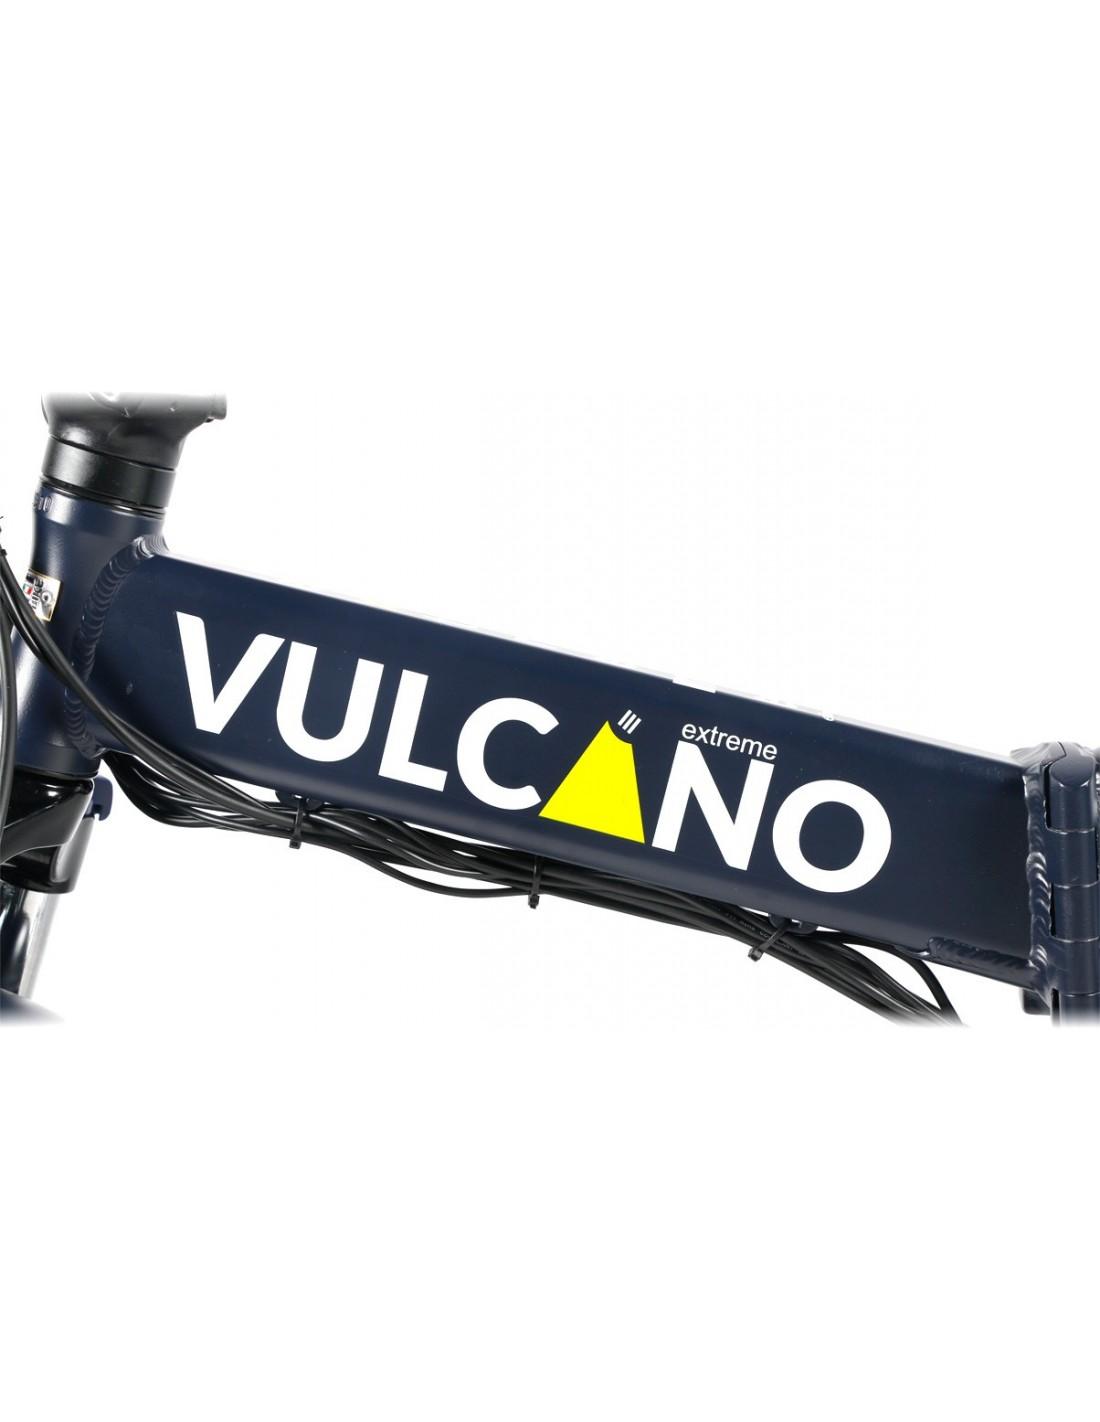 Dme Vulcano Extreme 20 271 500 Watt Freni Idraulici Tektro 48v